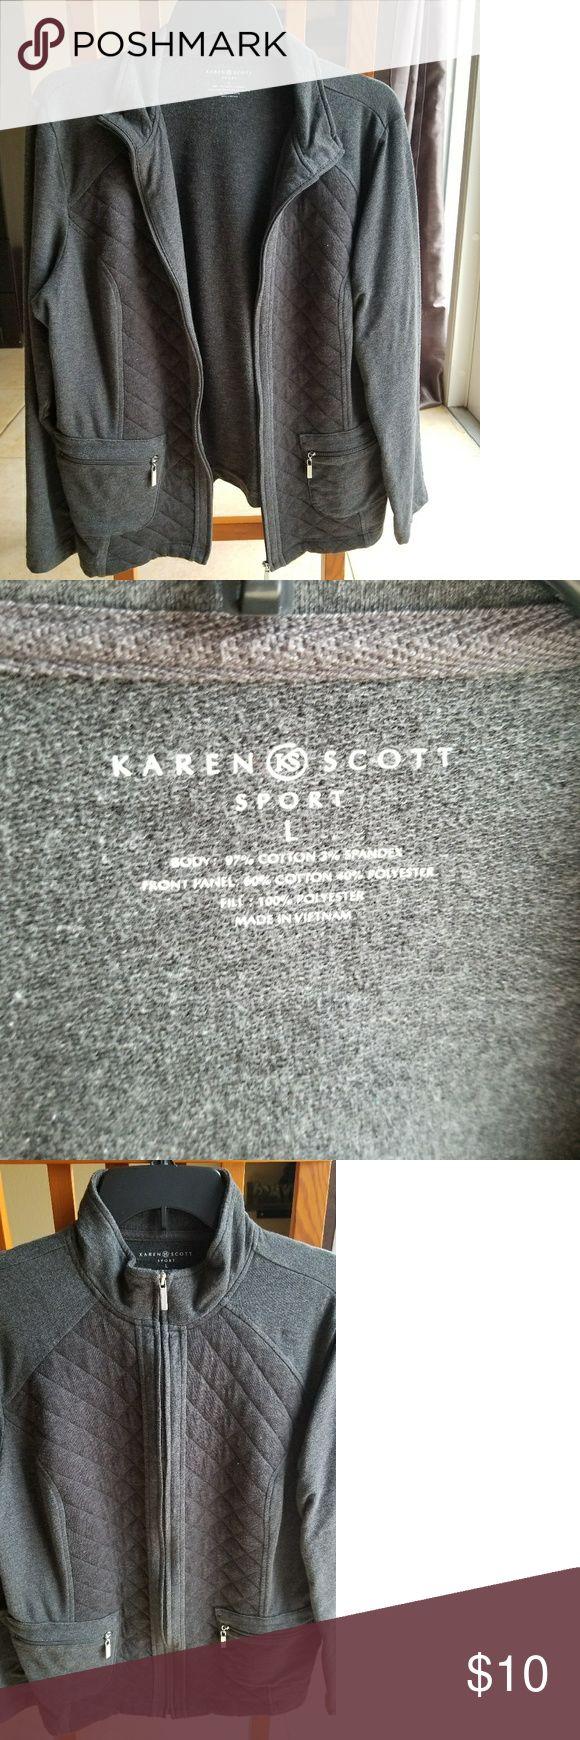 "Dark Gray Karen Scott Sport jacket size L Dark Gray color Karen Scott Sport jacket with zipper. Size L and measurements are from back neck to waist 24"", sleeve 23.5"" and bust size 20.5"". 2 pockets in the front with zipper. Sporty and great to match with jeans or slacks. Karen Scott Jackets & Coats Blazers"